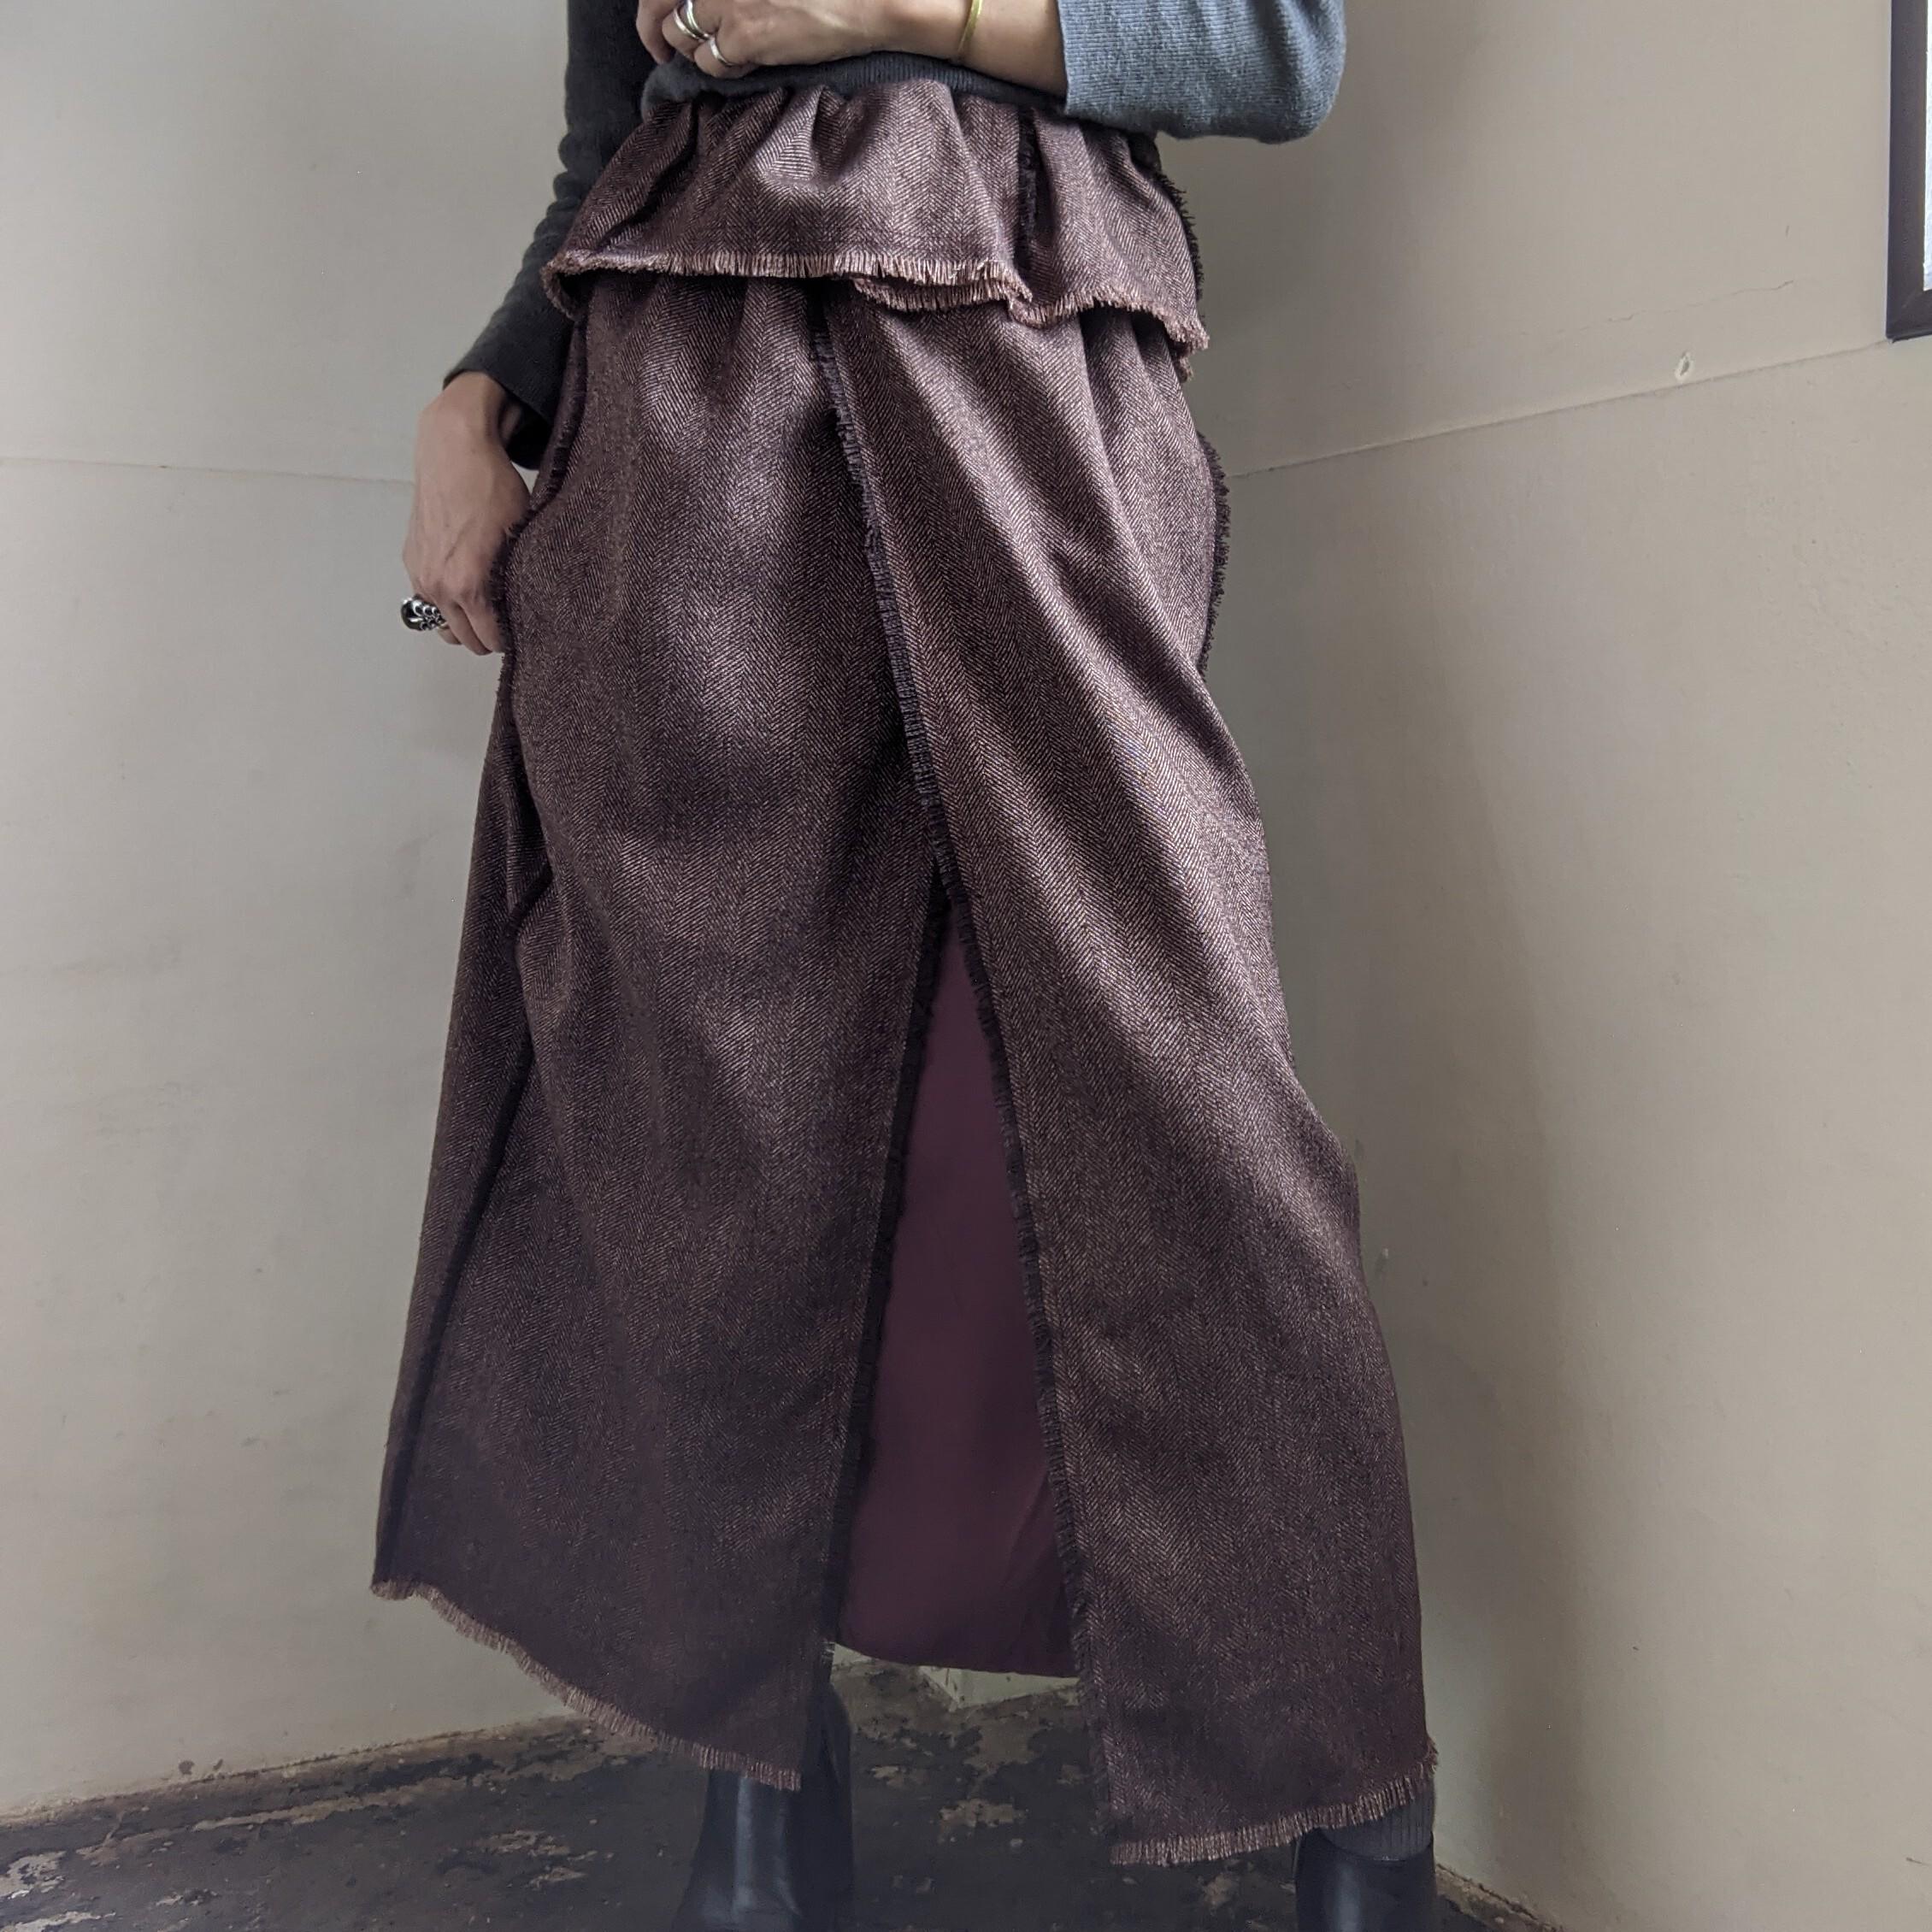 【 REHERSALL 】リハーズオール / ツイードフリンジスカート/  ブラウン BROWN  / ロングスカート